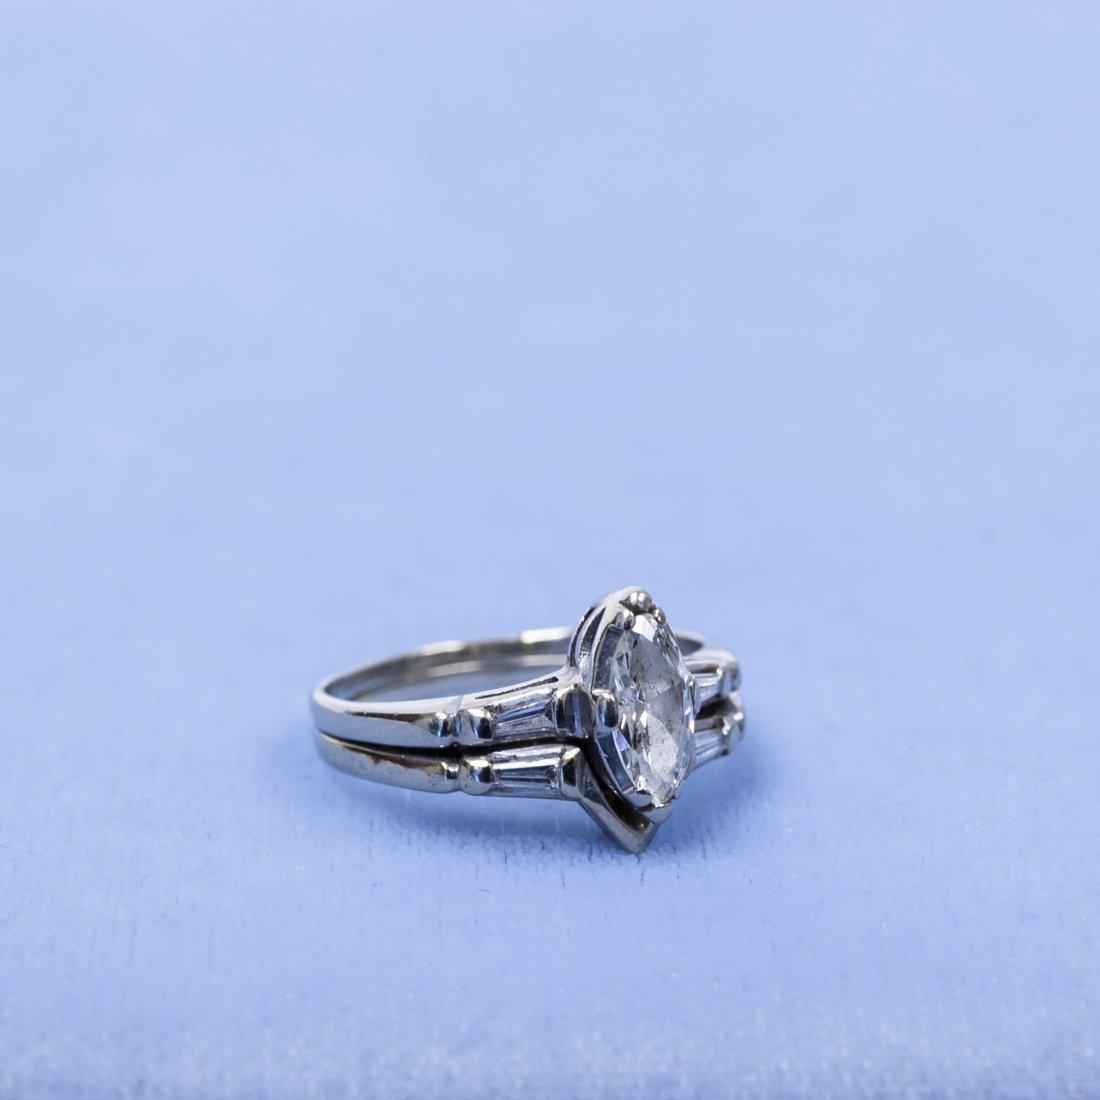 14K White Gold and Diamond Ring.